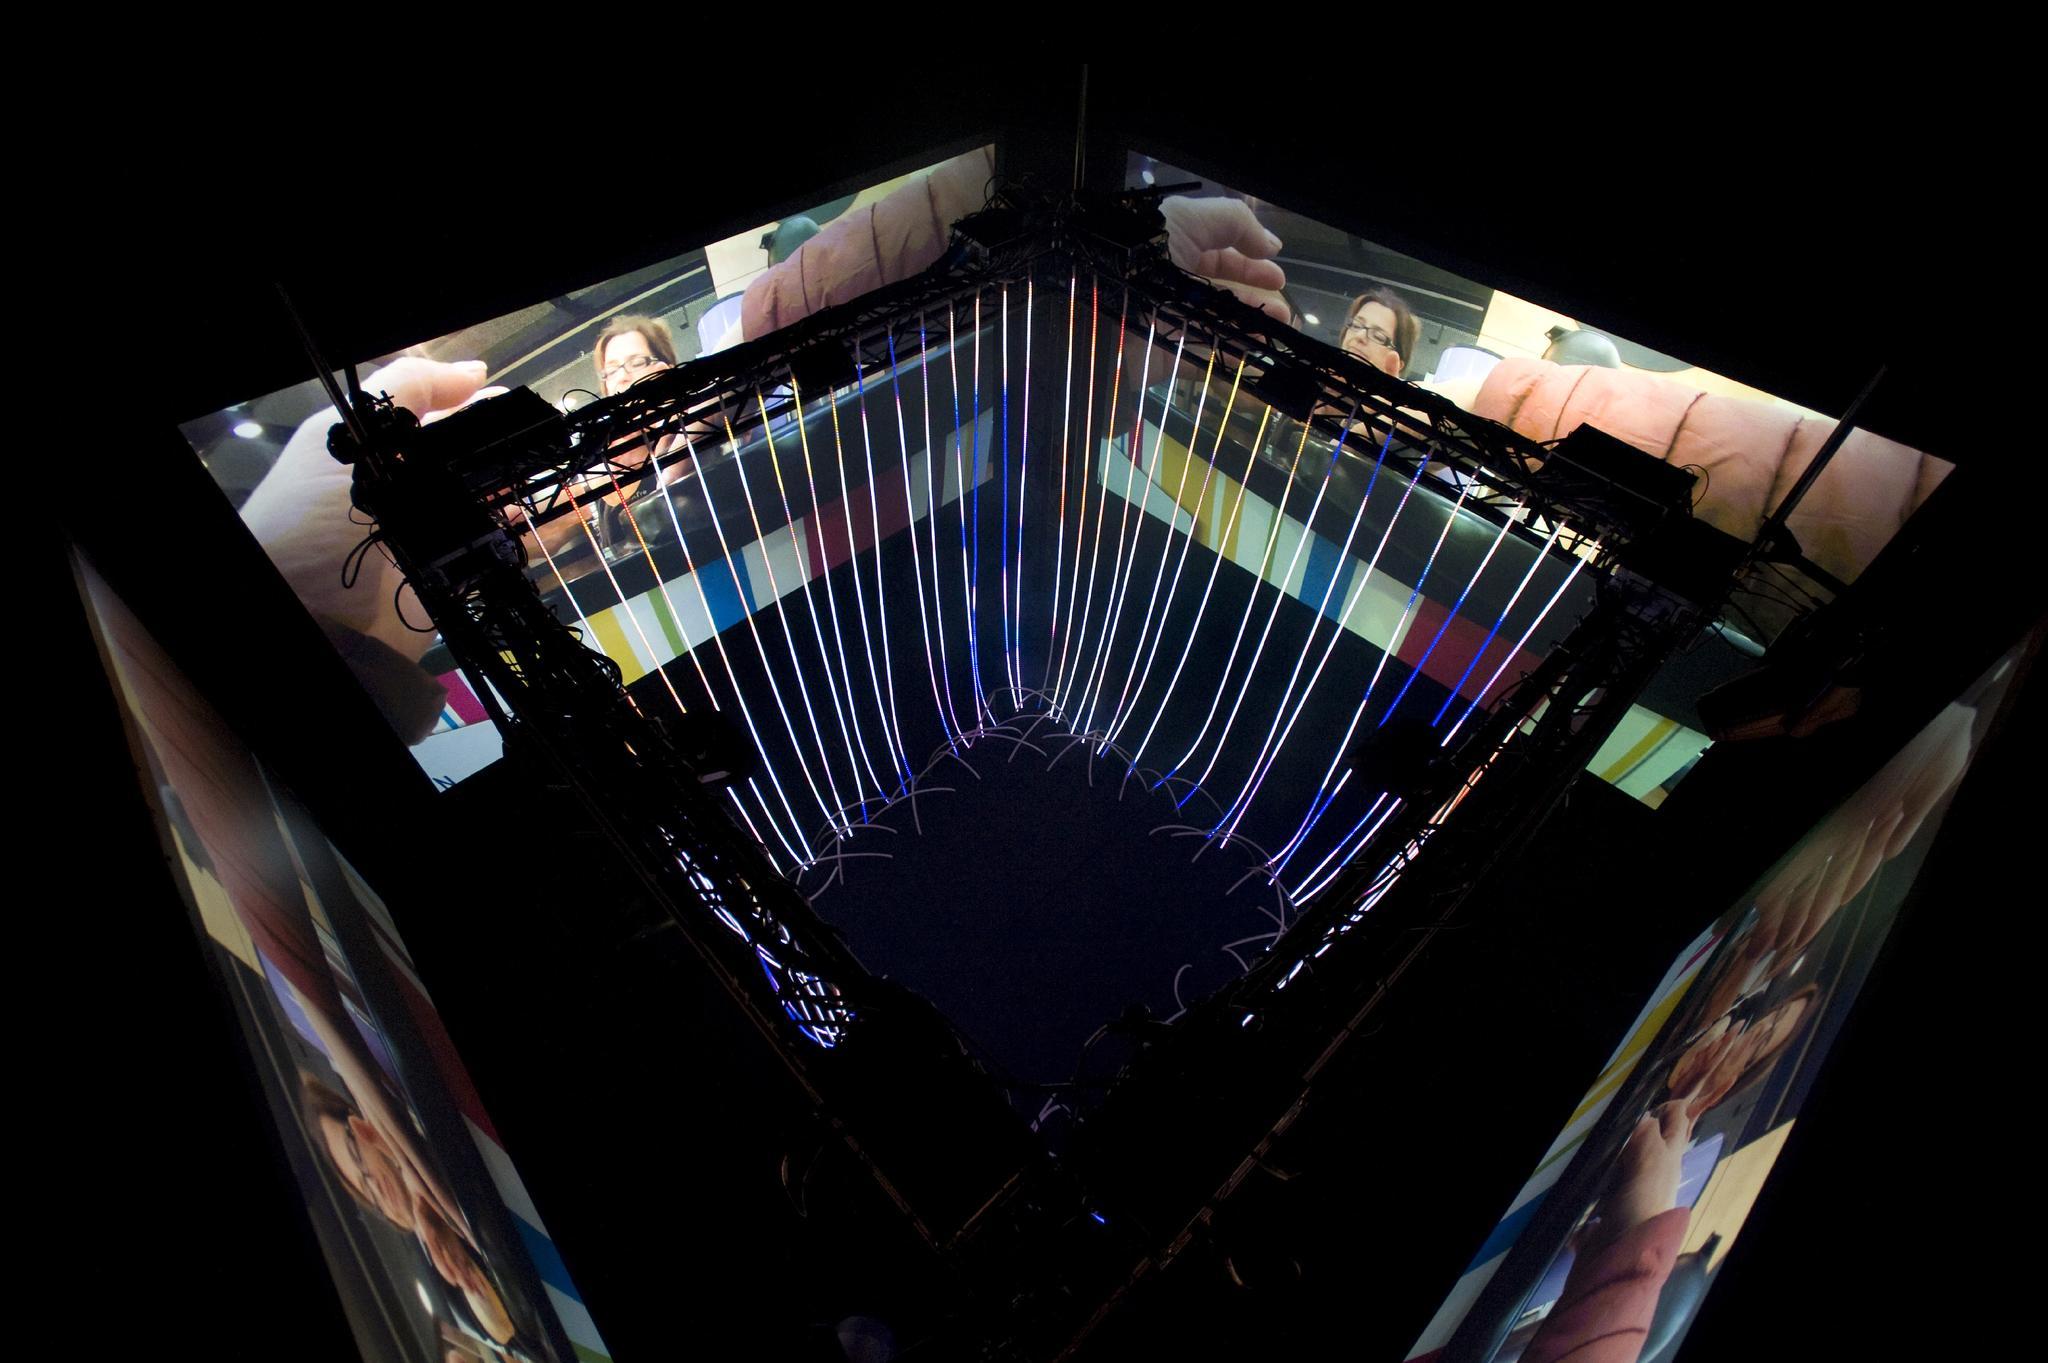 Ground-breaking Installation 'Blackout Immersive' to run at PLASA Show 2019